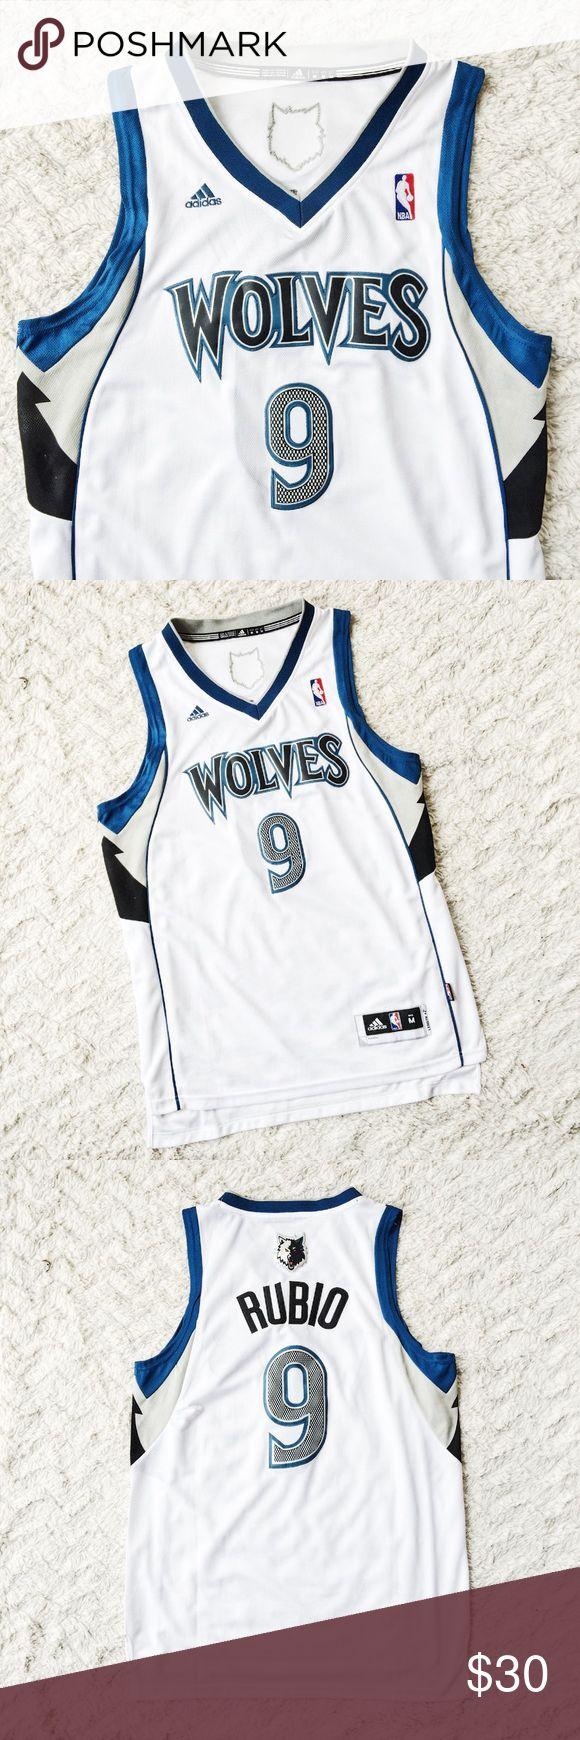 123teachme tank game colors - Adidas Timberwolves Jersey 9 Rubio Adidas Timberwolves Jersey 9 Rubio Size